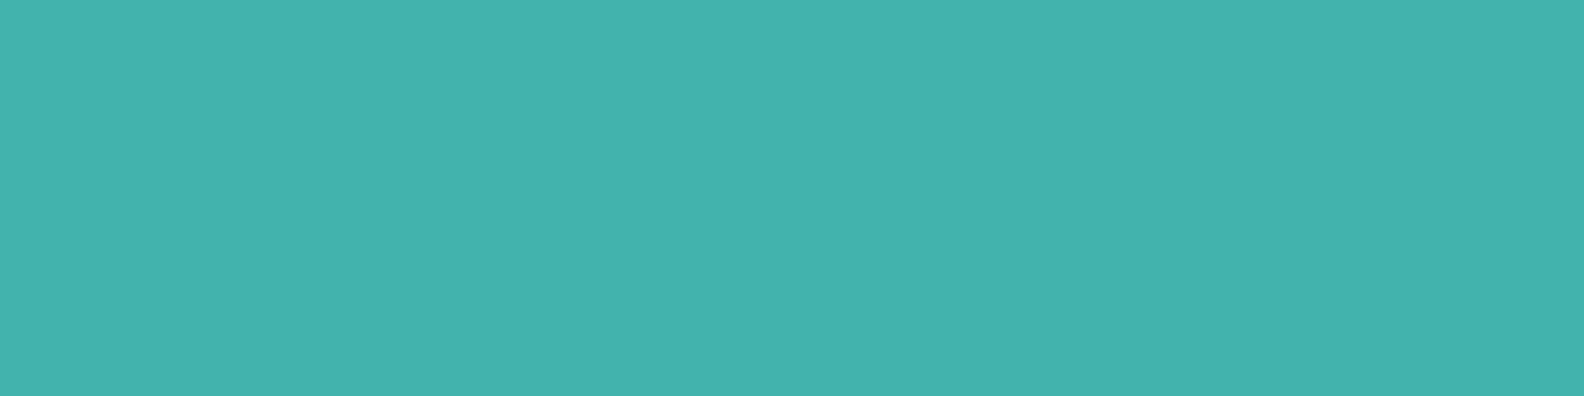 1584x396 Verdigris Solid Color Background